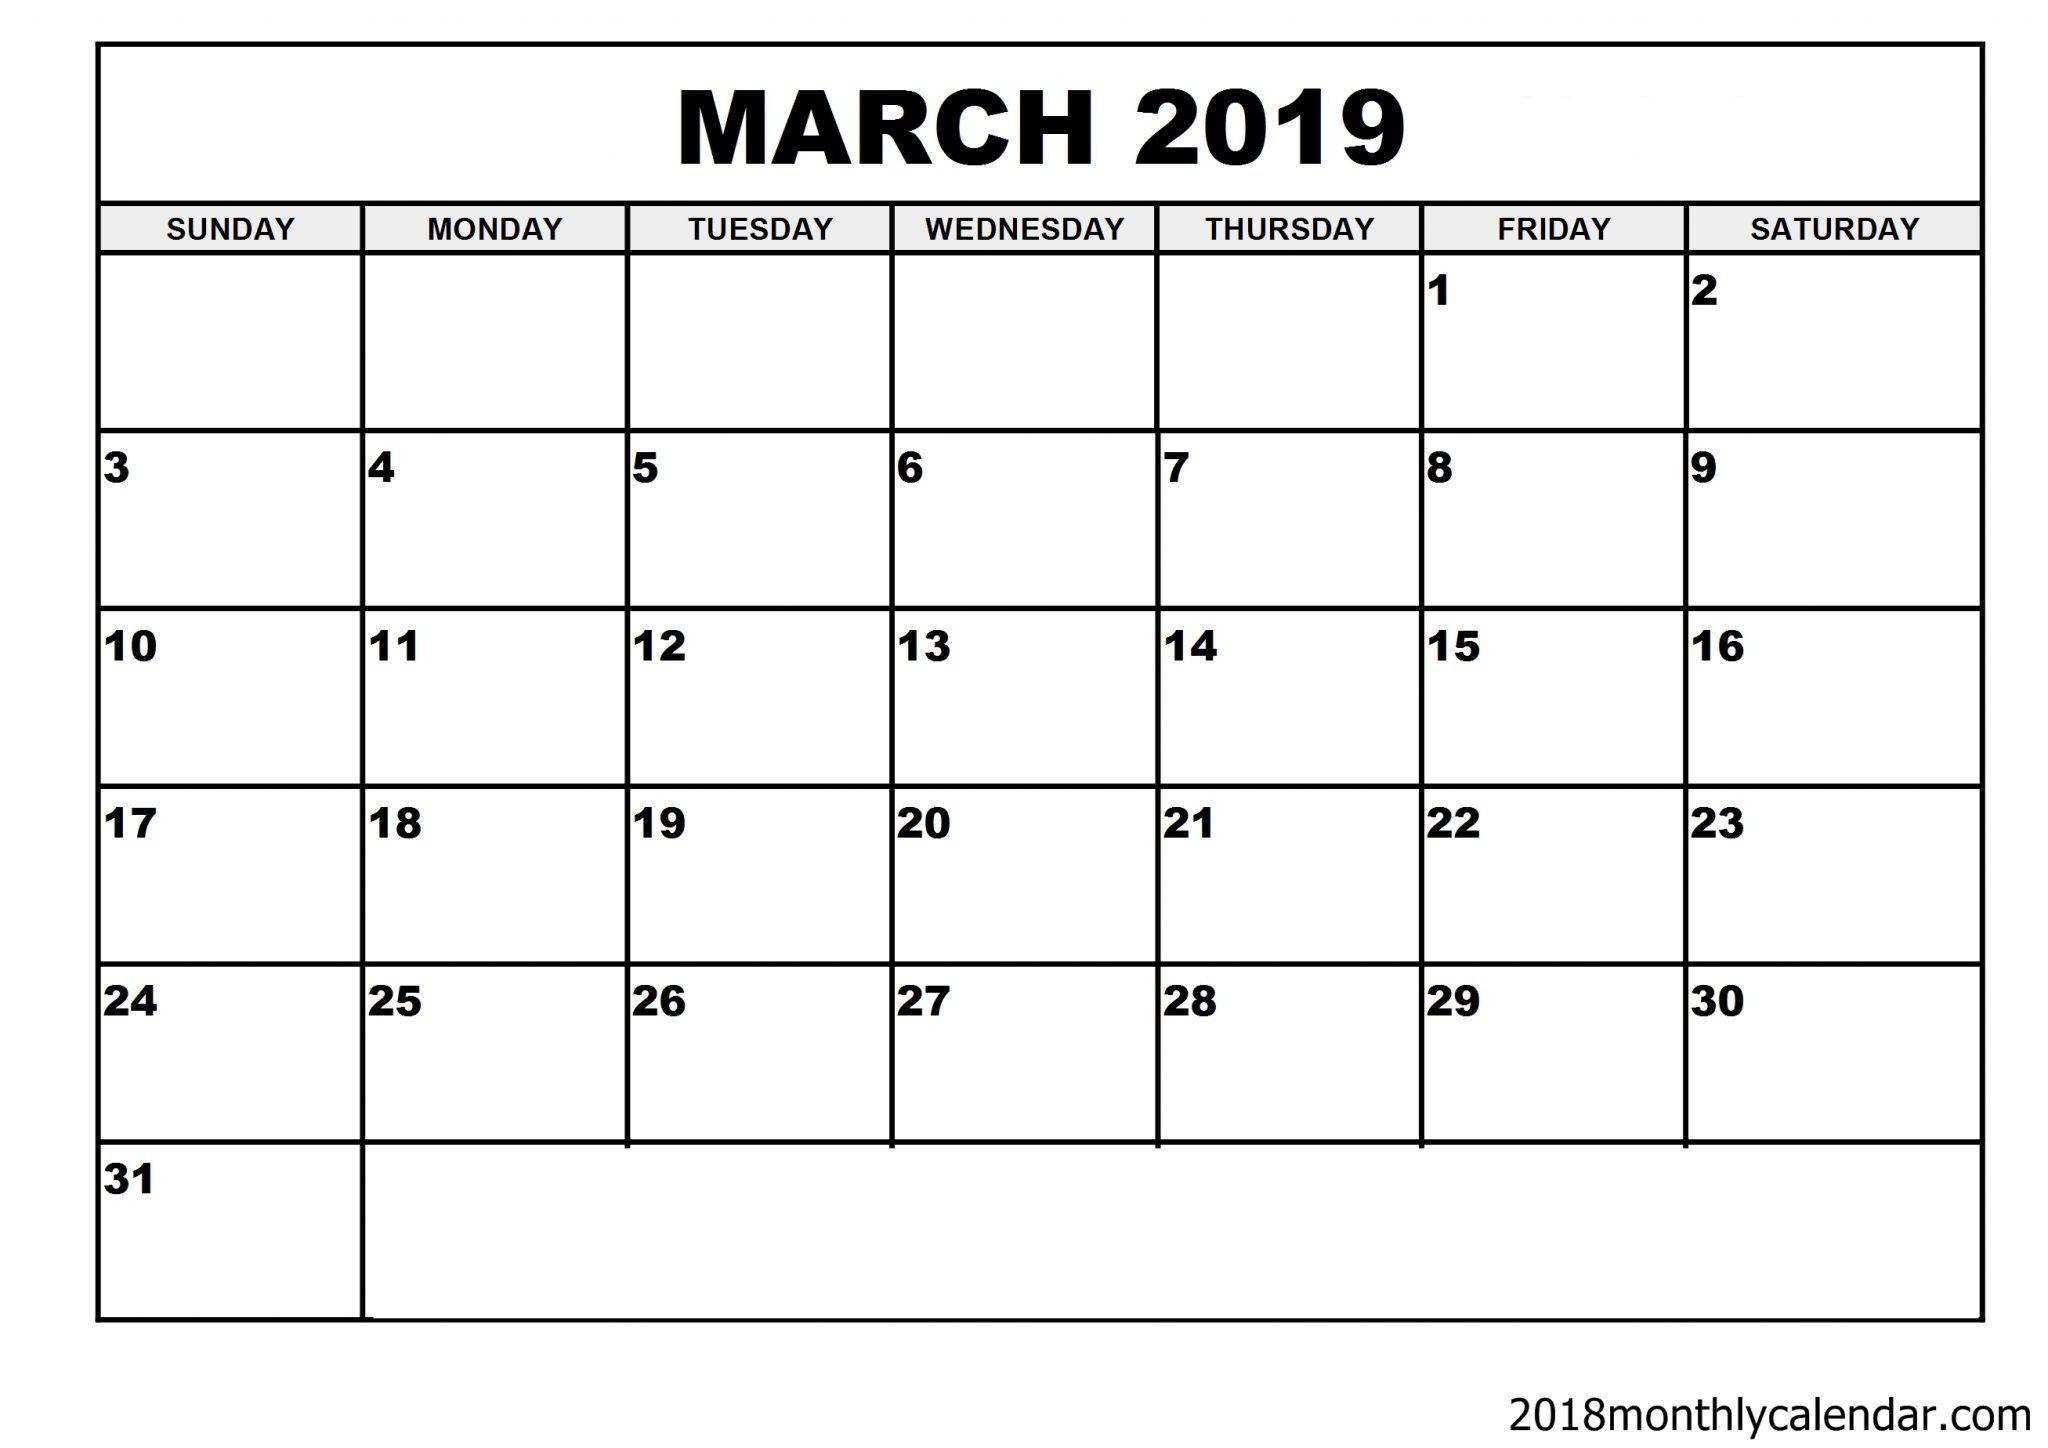 hindu calendar march 2019 mas actual 149 best free march 2019 calendar printable templates images in 2019 of hindu calendar march 2019